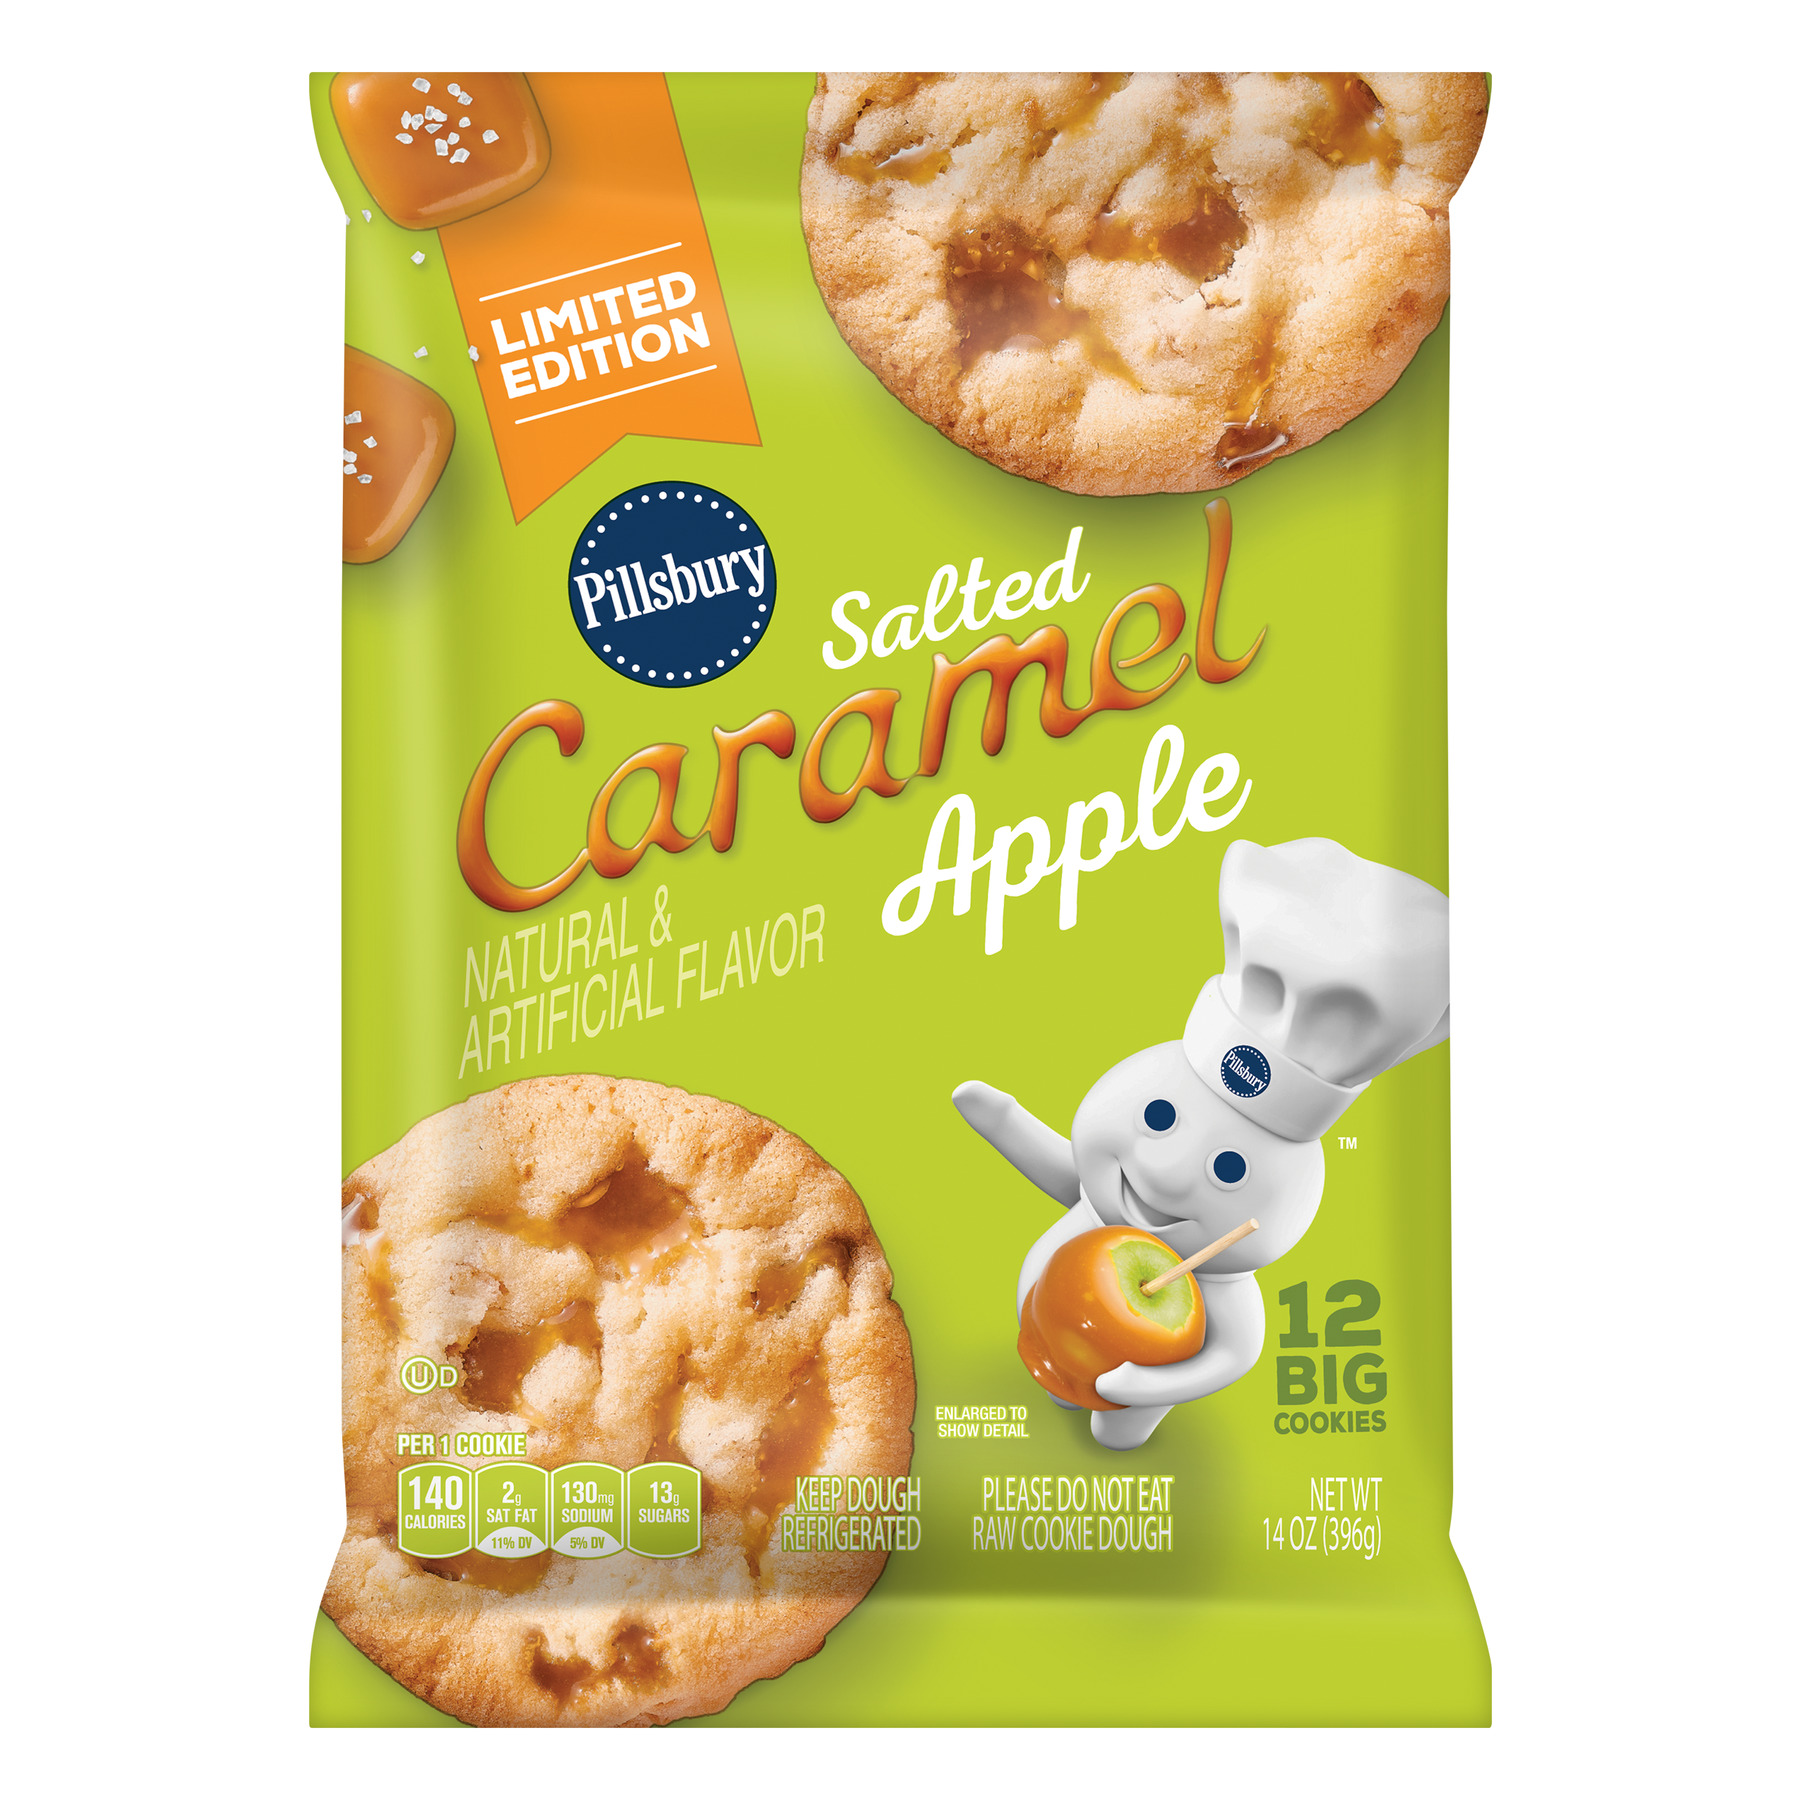 Pillsbury Salted Caramel Apple Cookies, 14.0 OZ